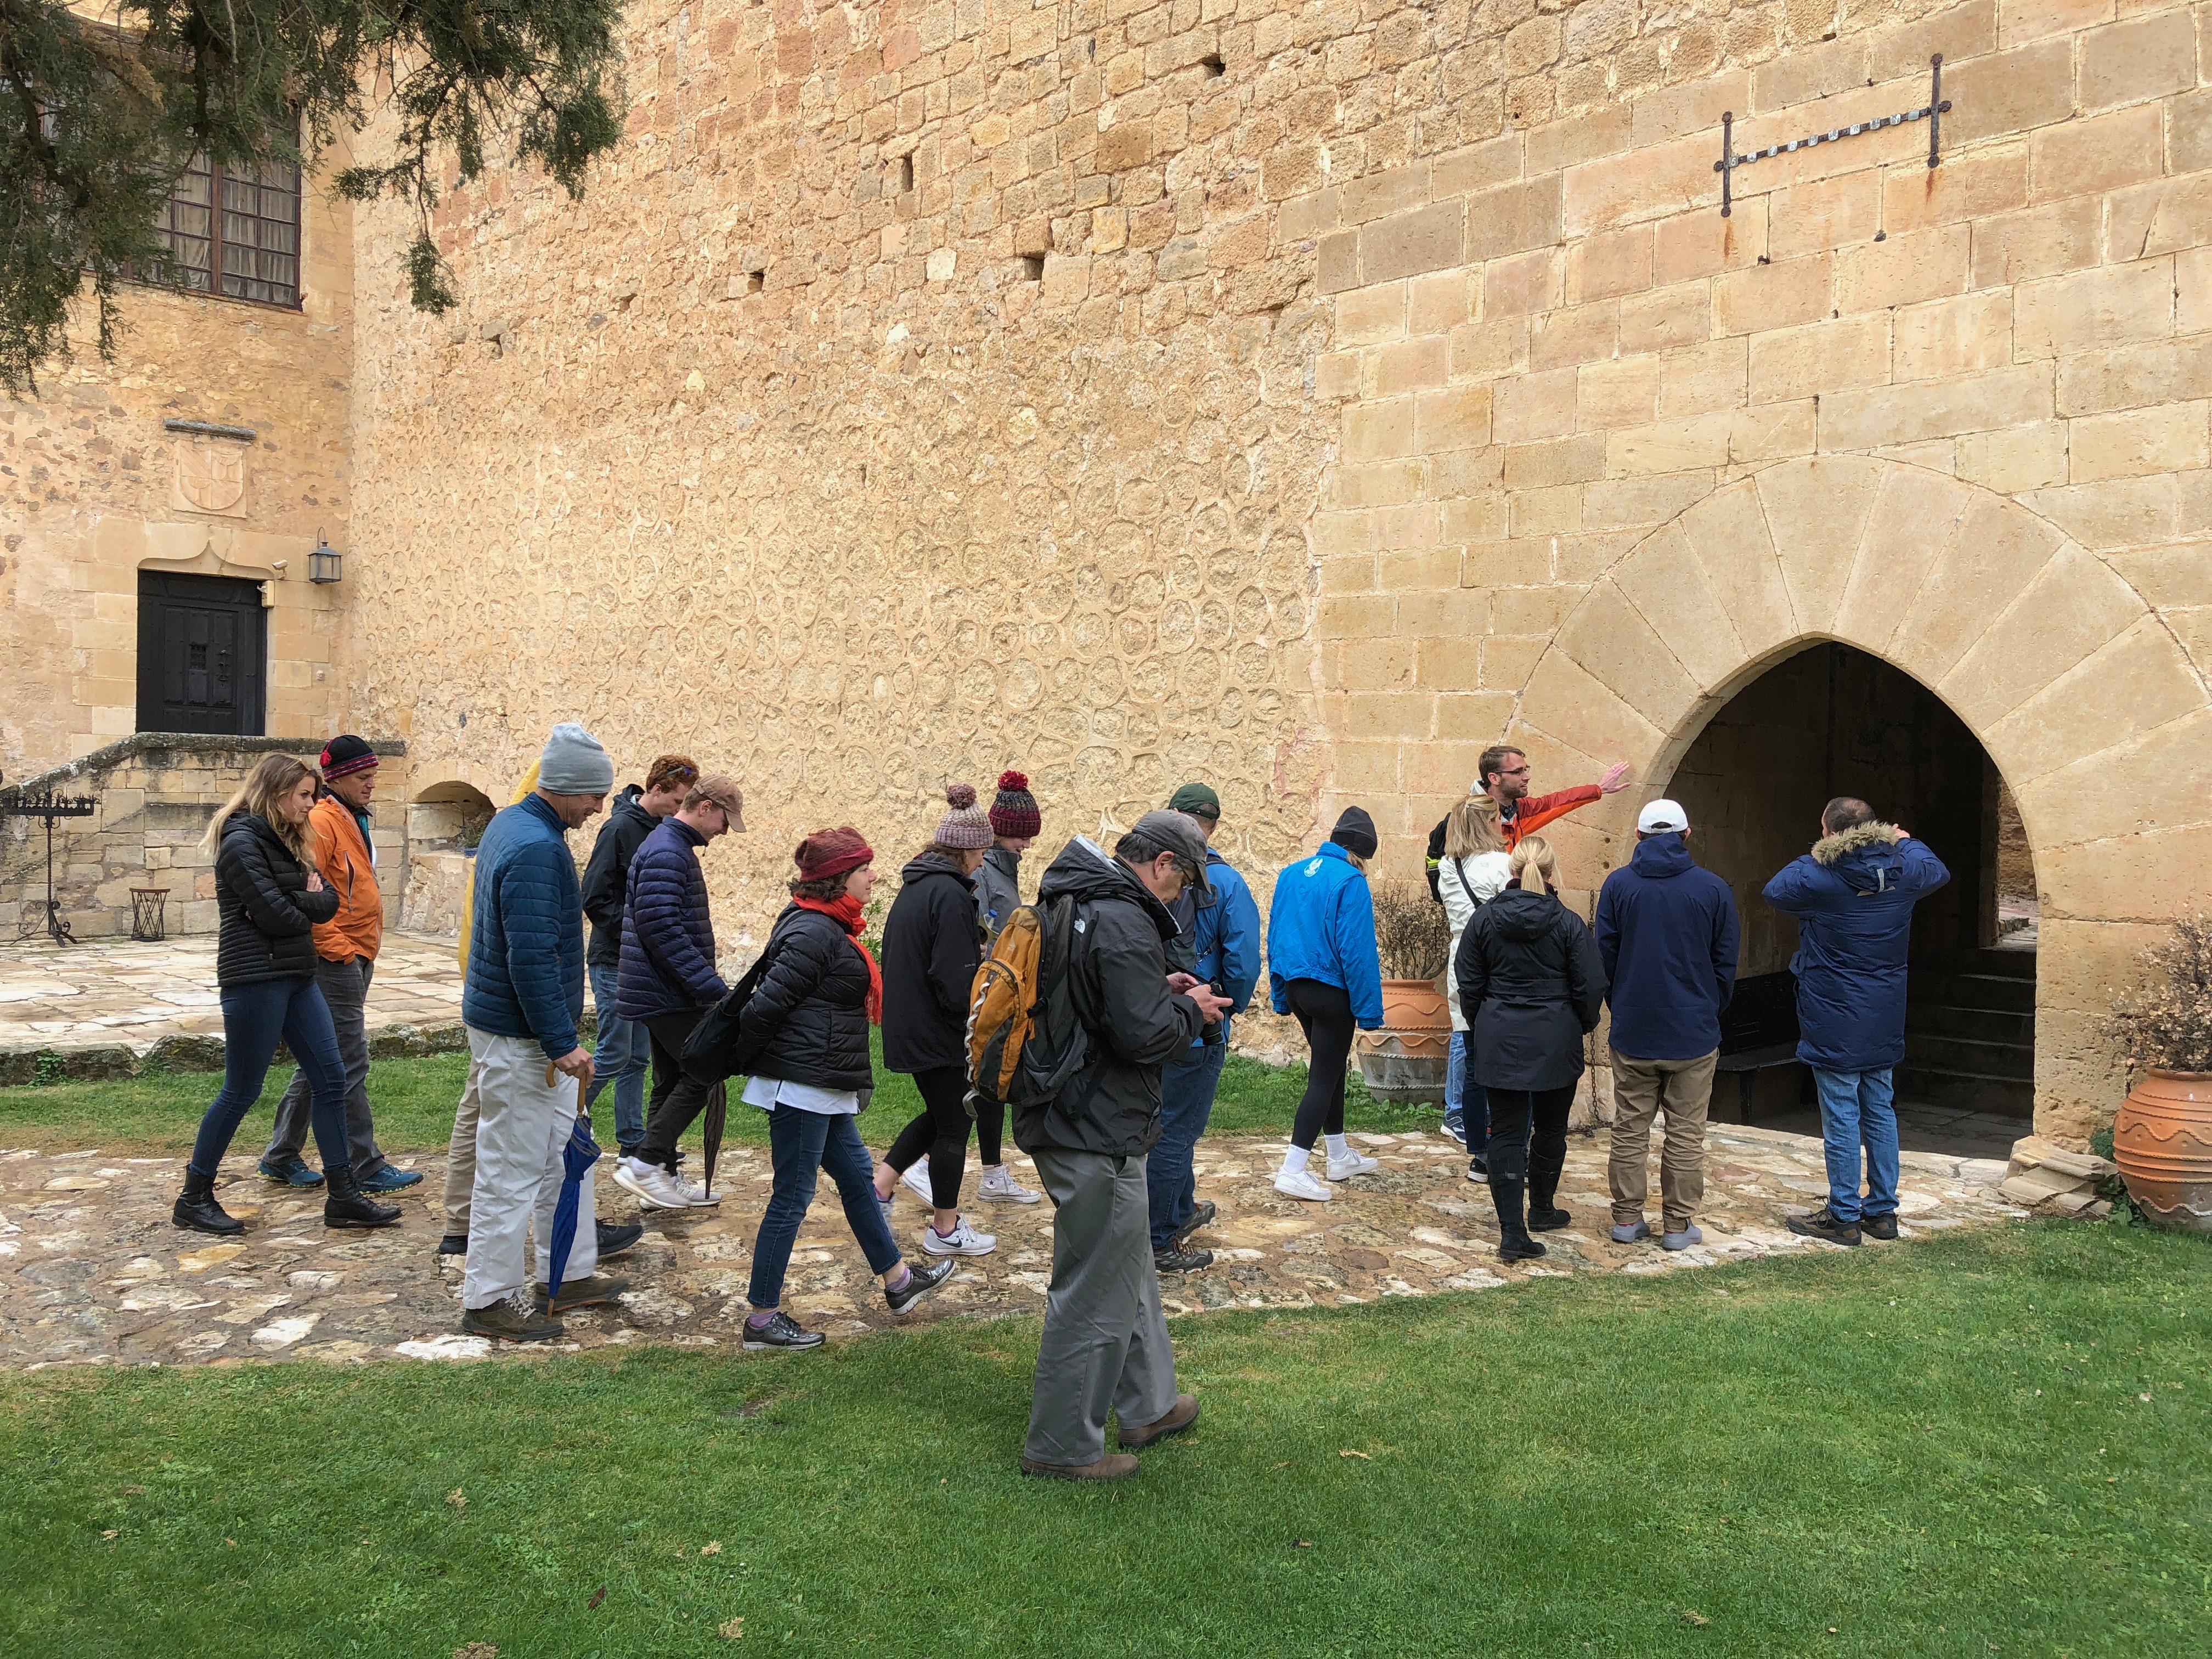 Proctor en Segovia family weekend visit to Pedraza.